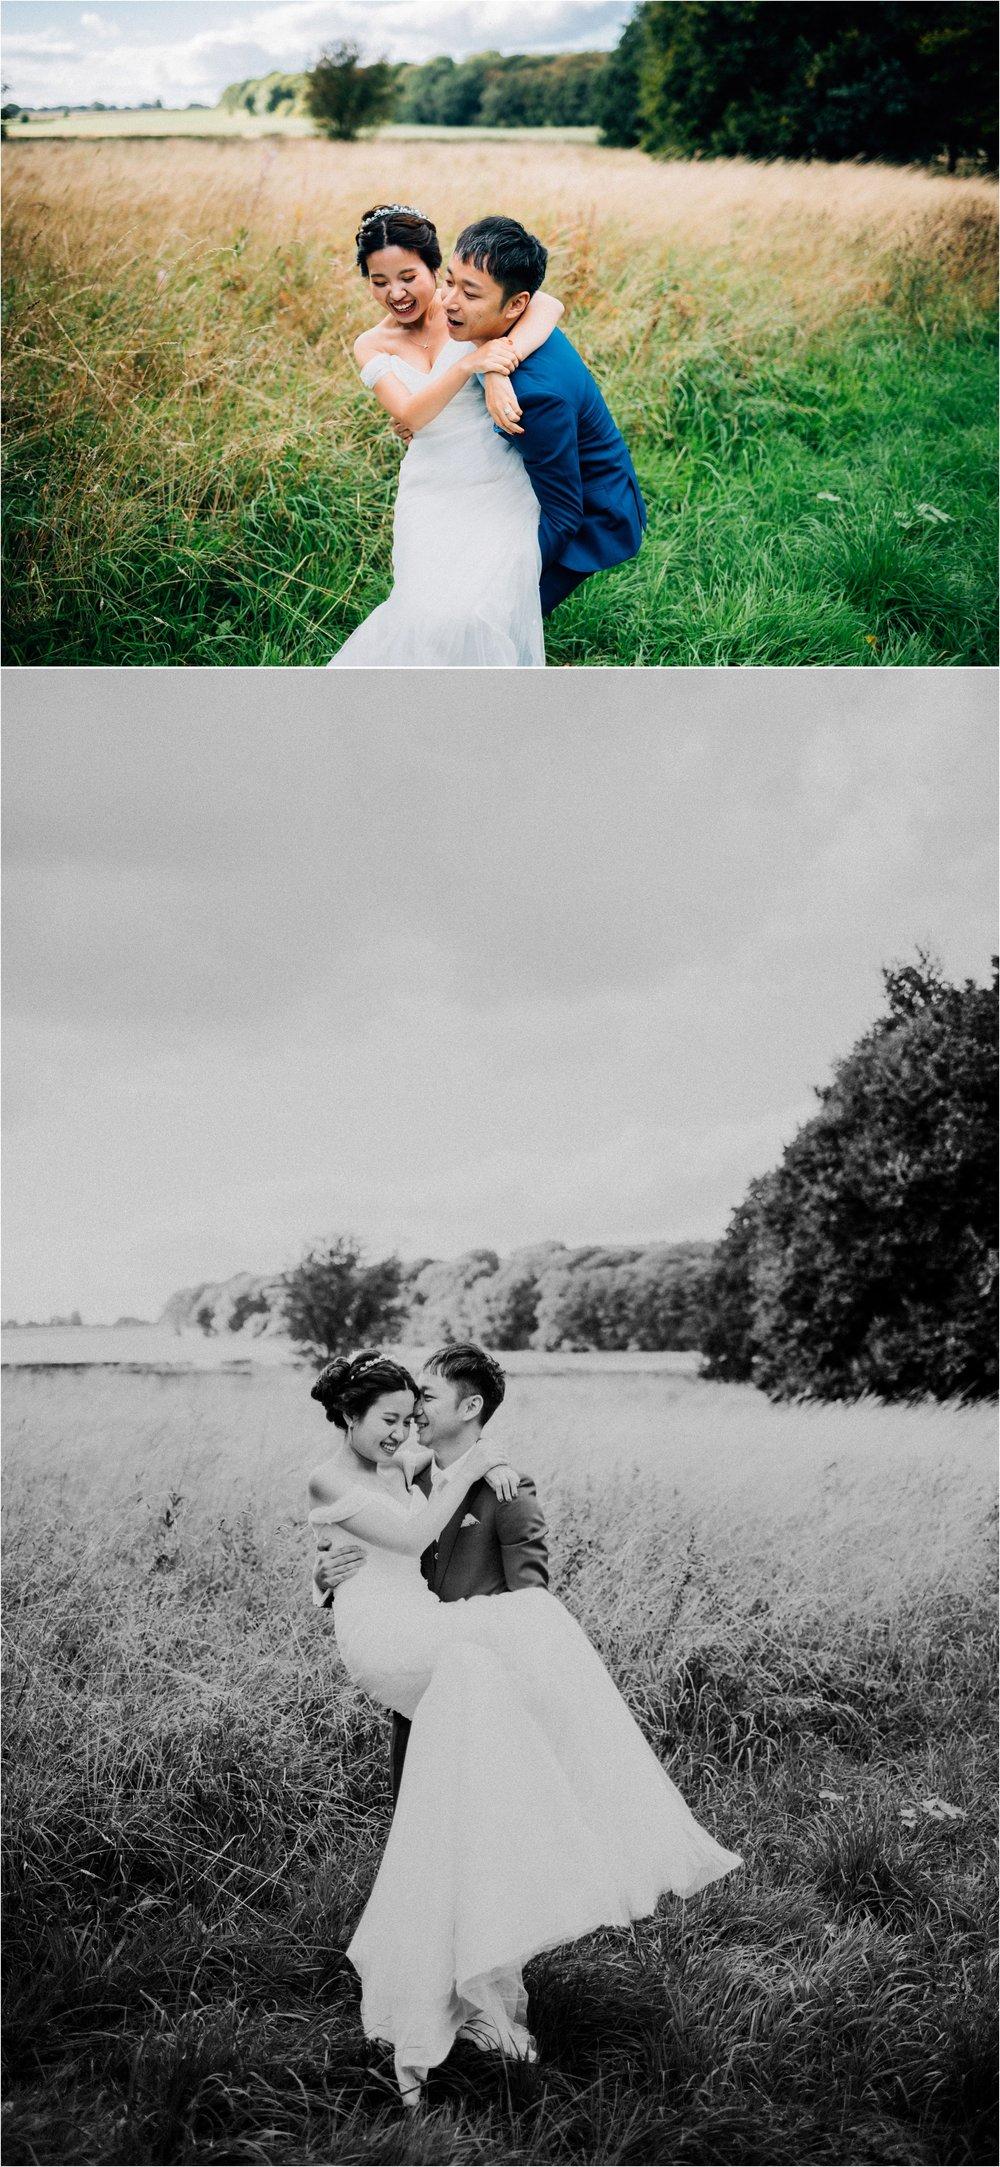 York city elopement wedding photographer_0209.jpg